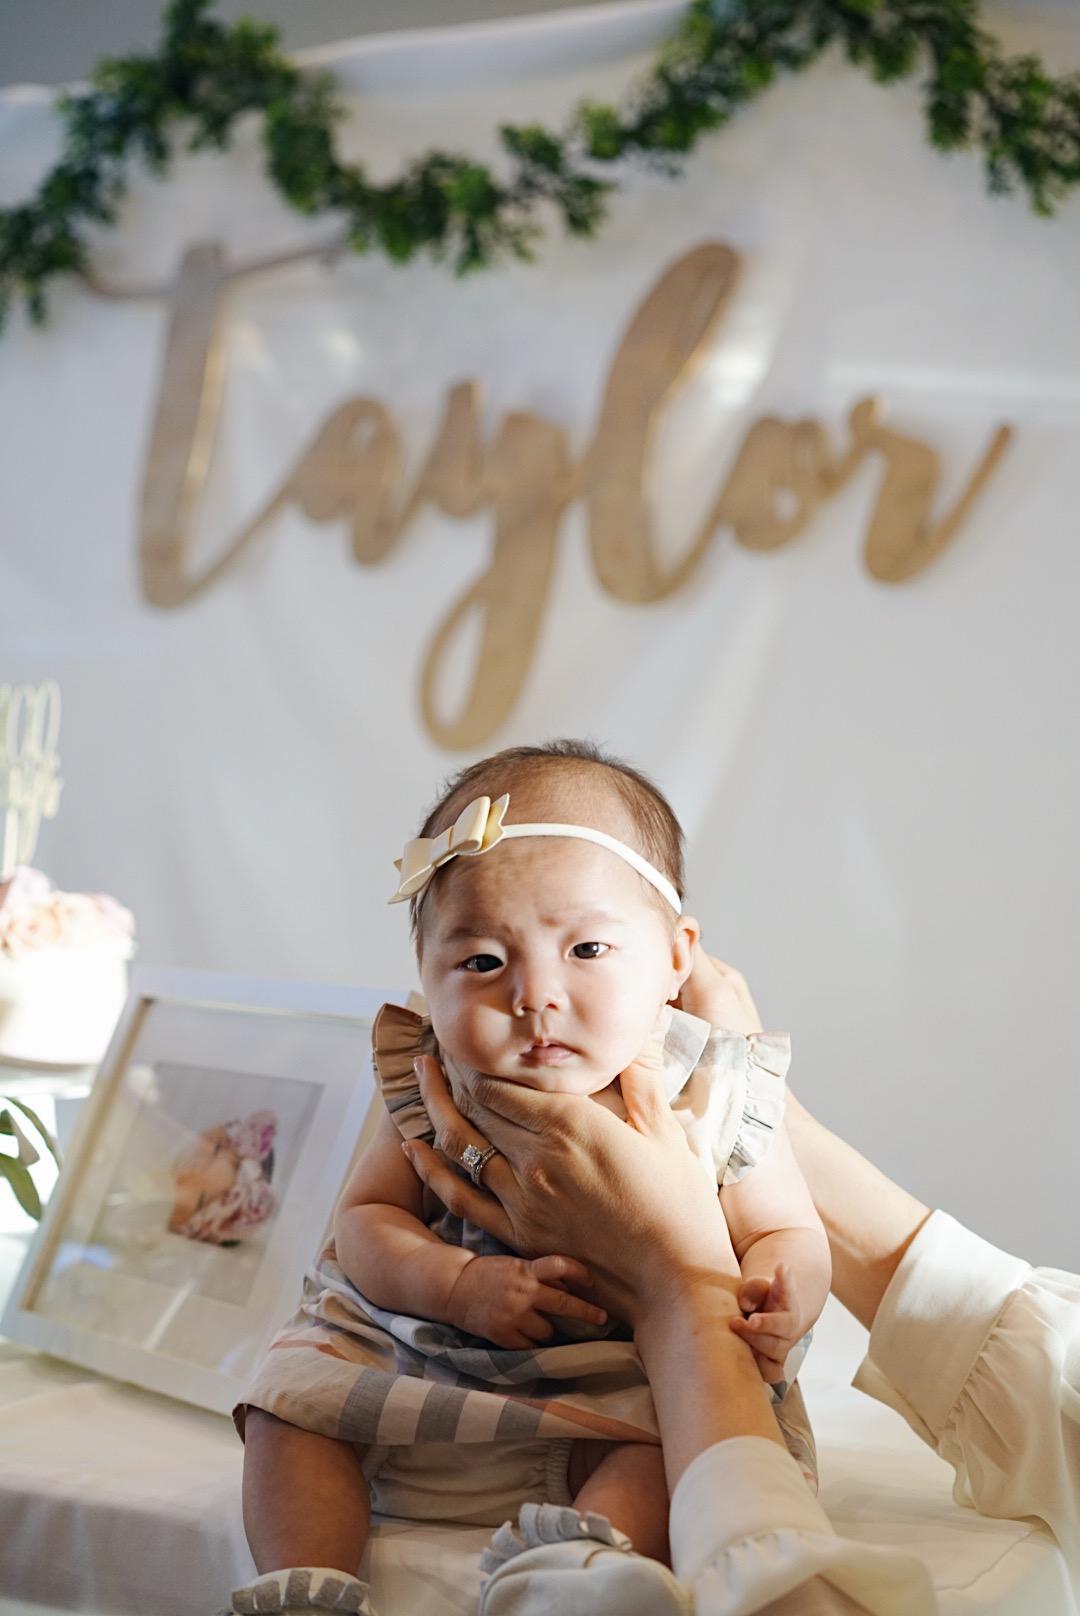 Headband: BabyBling | Dress: Burberry Kids | Shoes: Freshly Picked